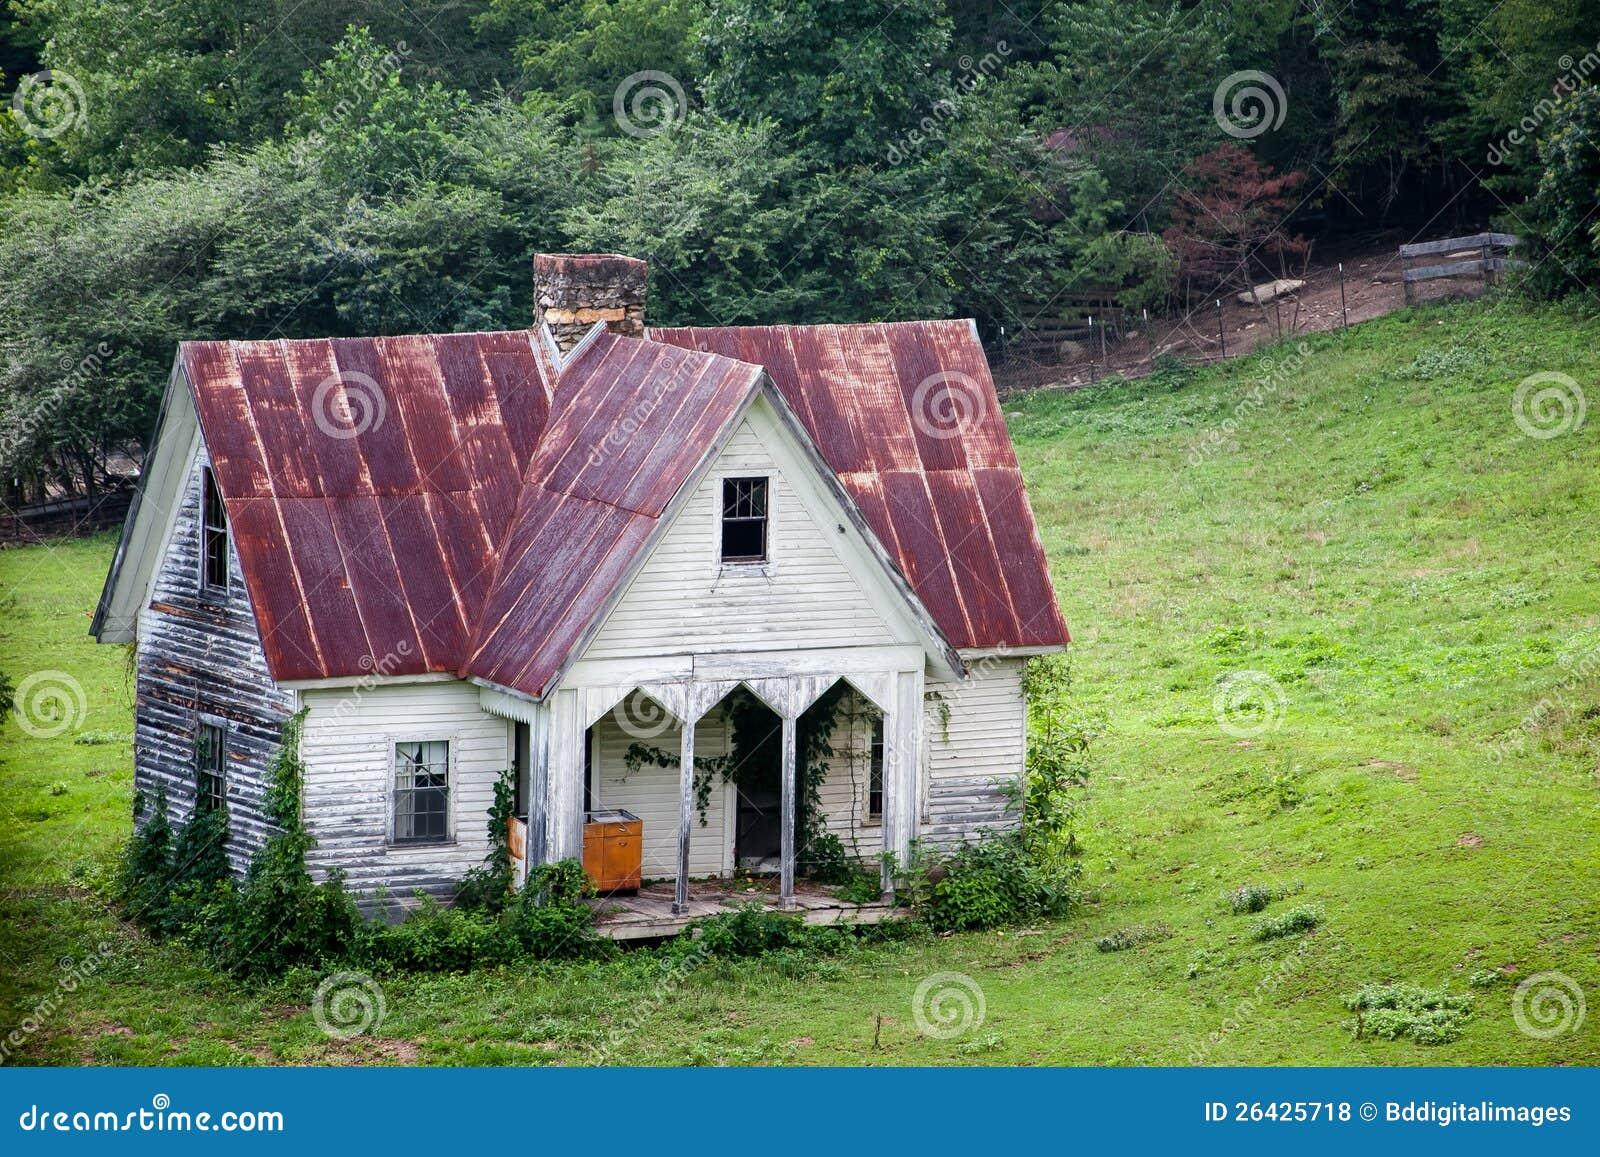 Sehr altes land haus lizenzfreie stockfotos bild 26425718 for Old country homes